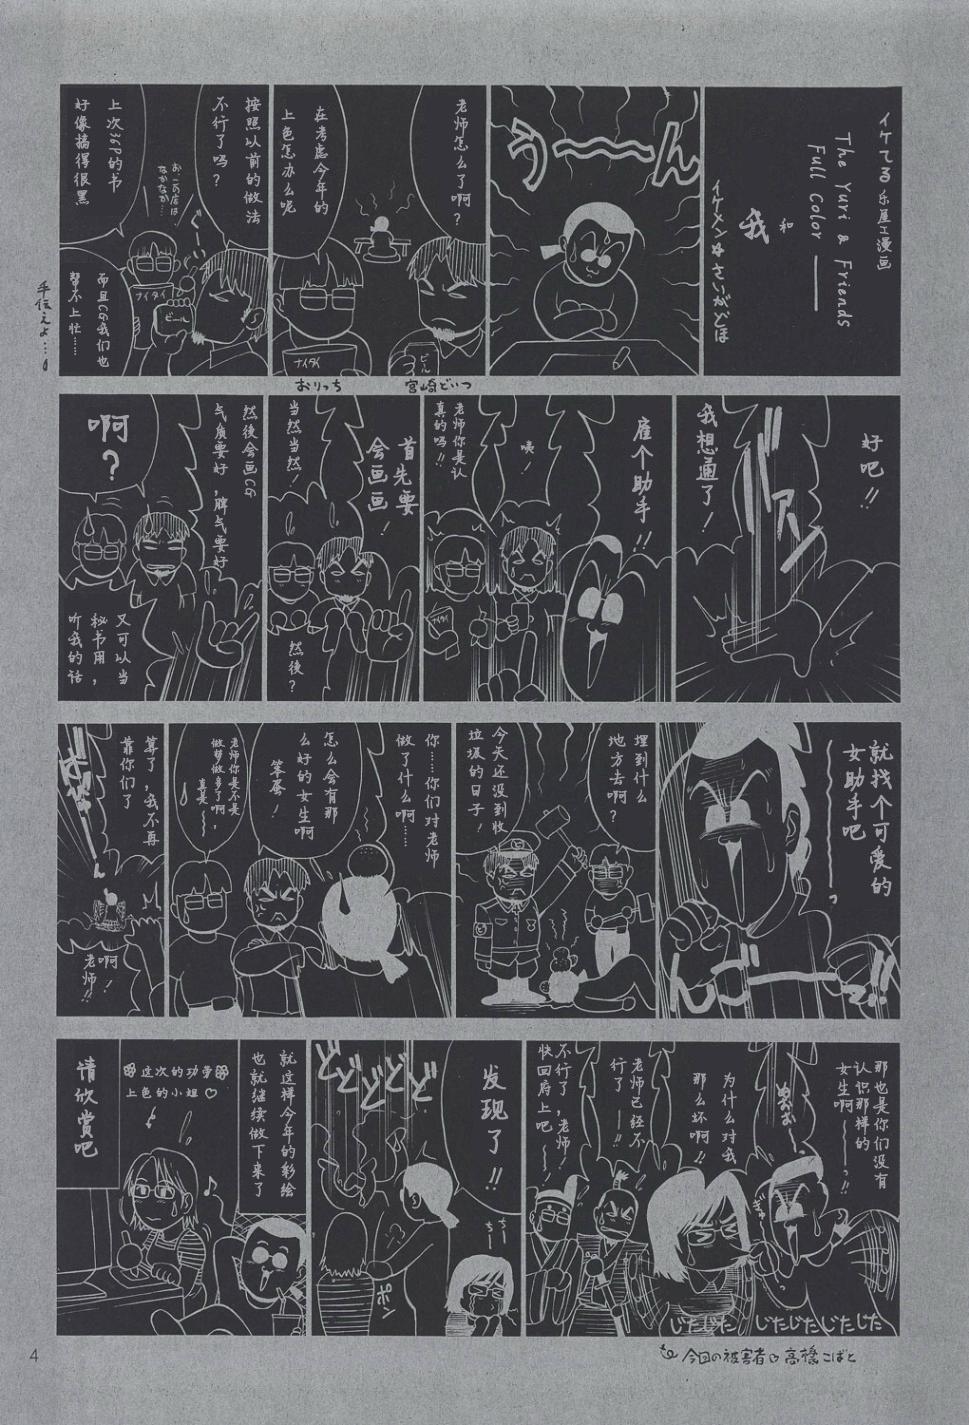 The Yuri & Friends Fullcolor 4 SAKURA vs. YURI EDITION 2